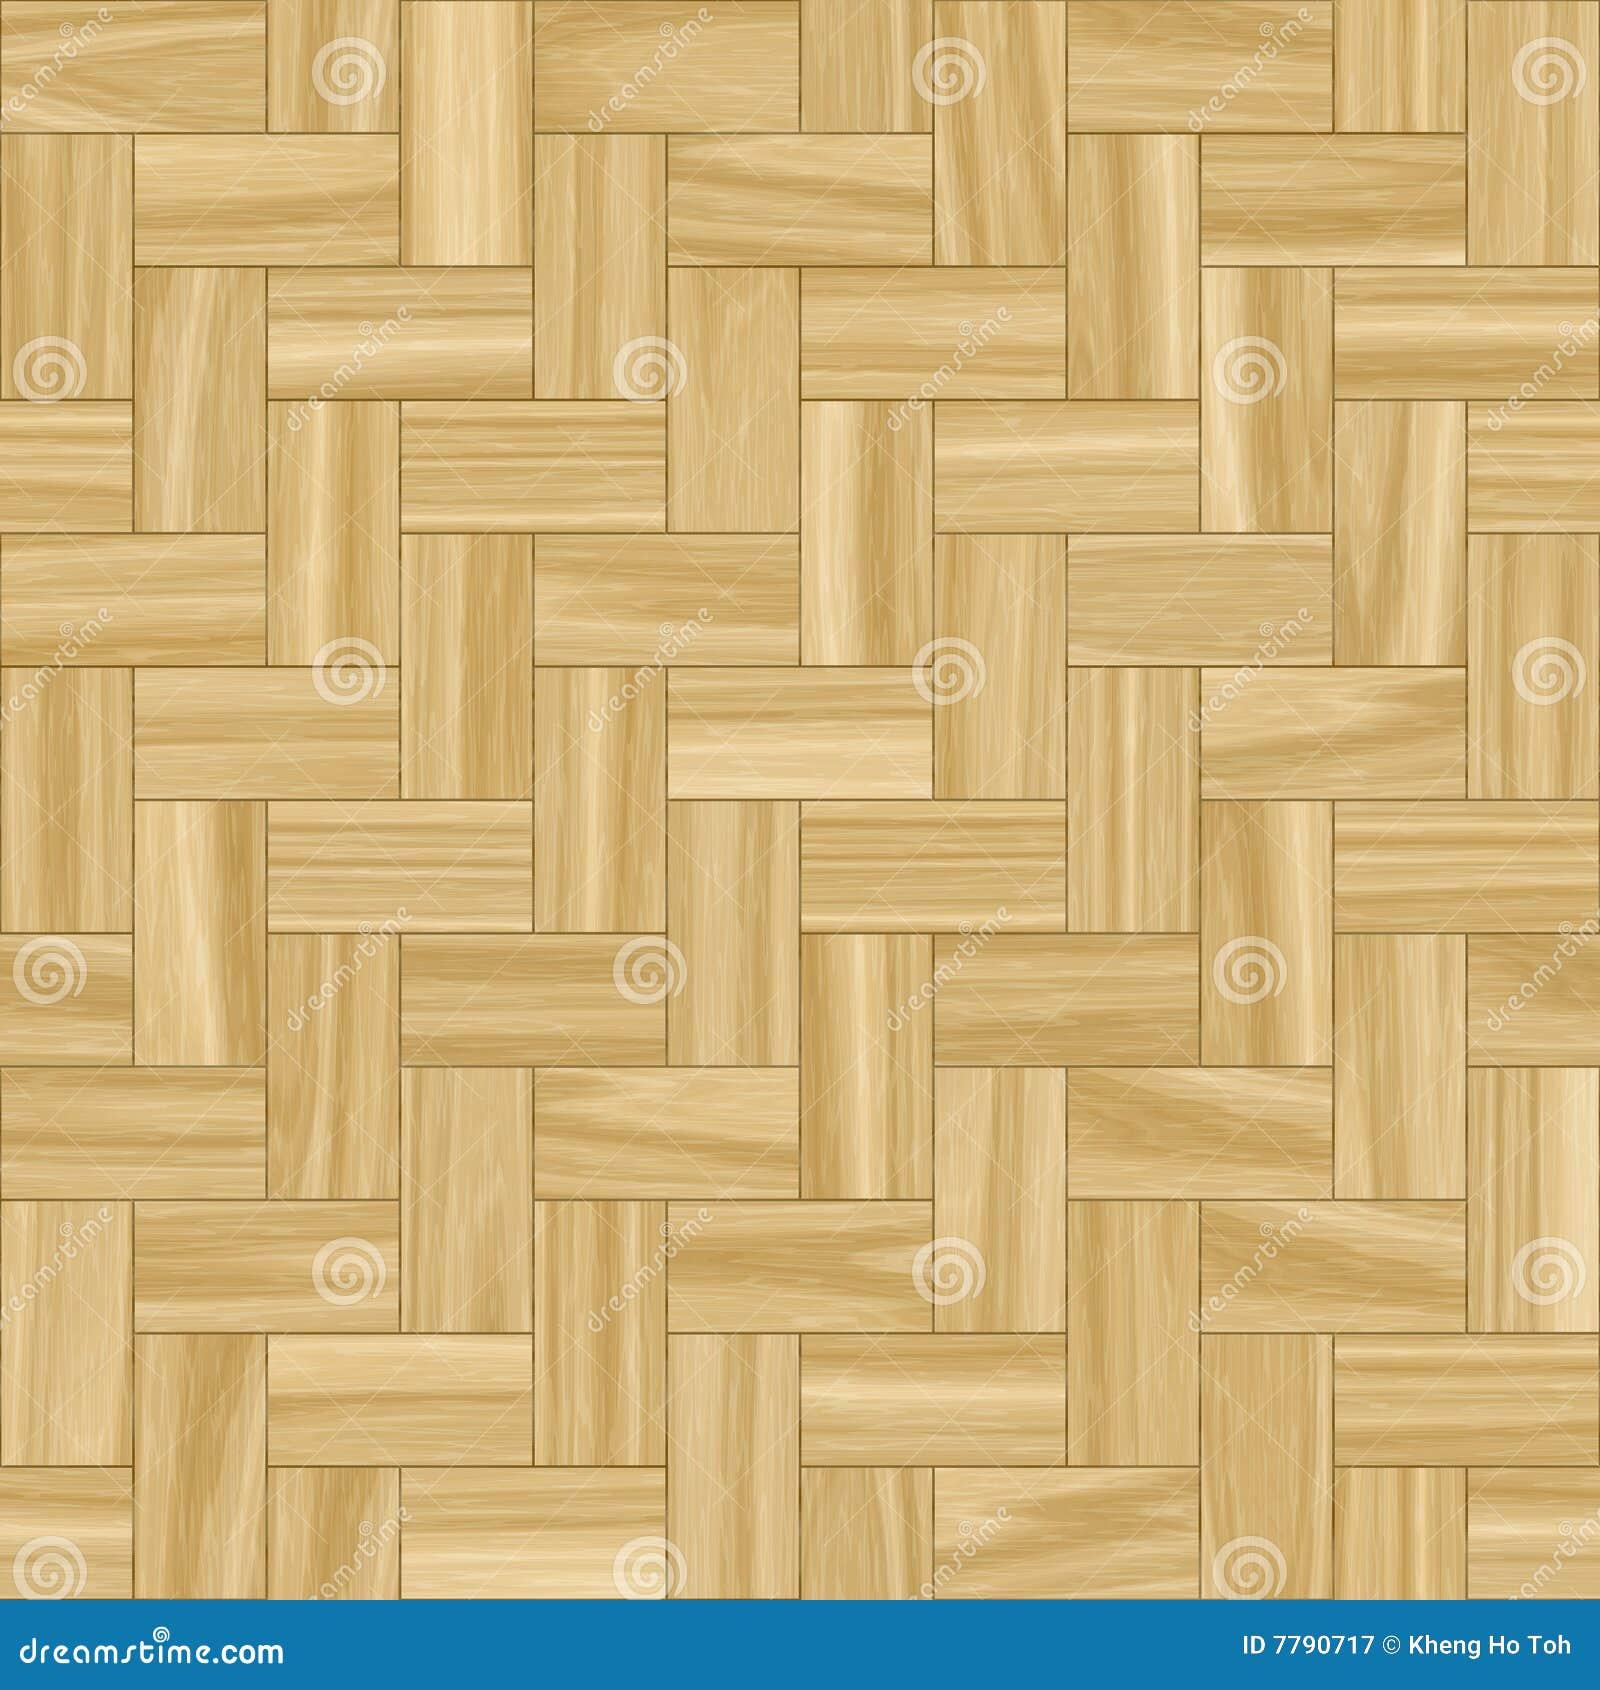 Wooden Parquet Flooring Stock Illustration Illustration Of Clean